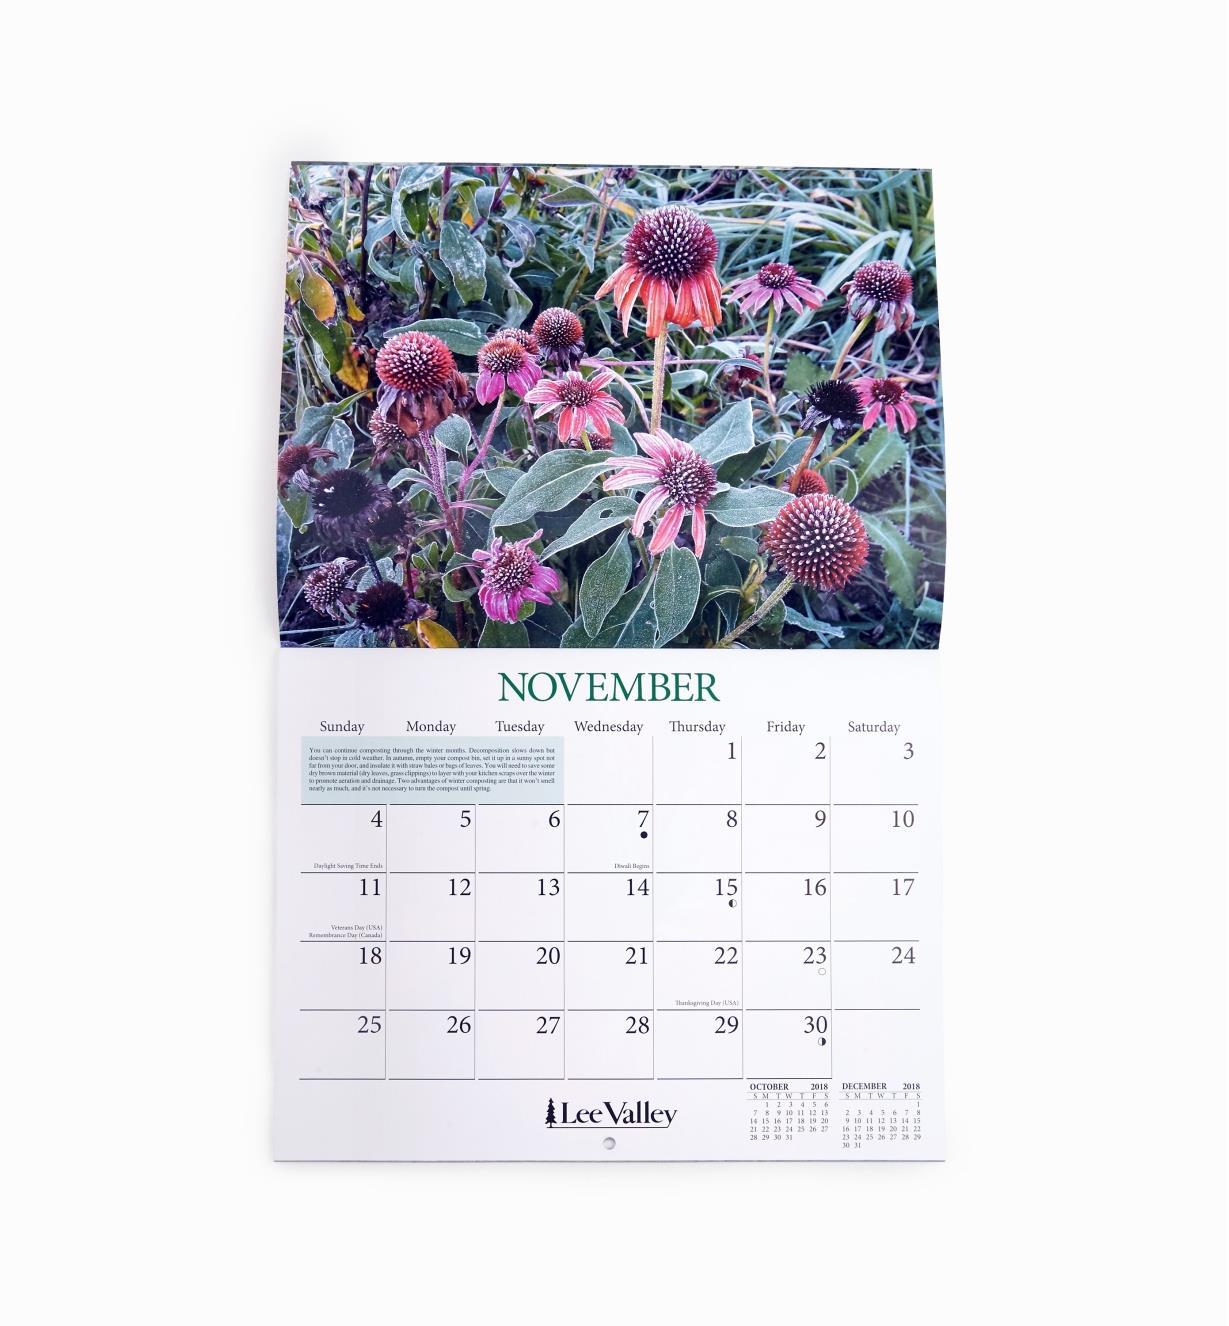 49L0797 - 2018/2019 Gardening Calendar